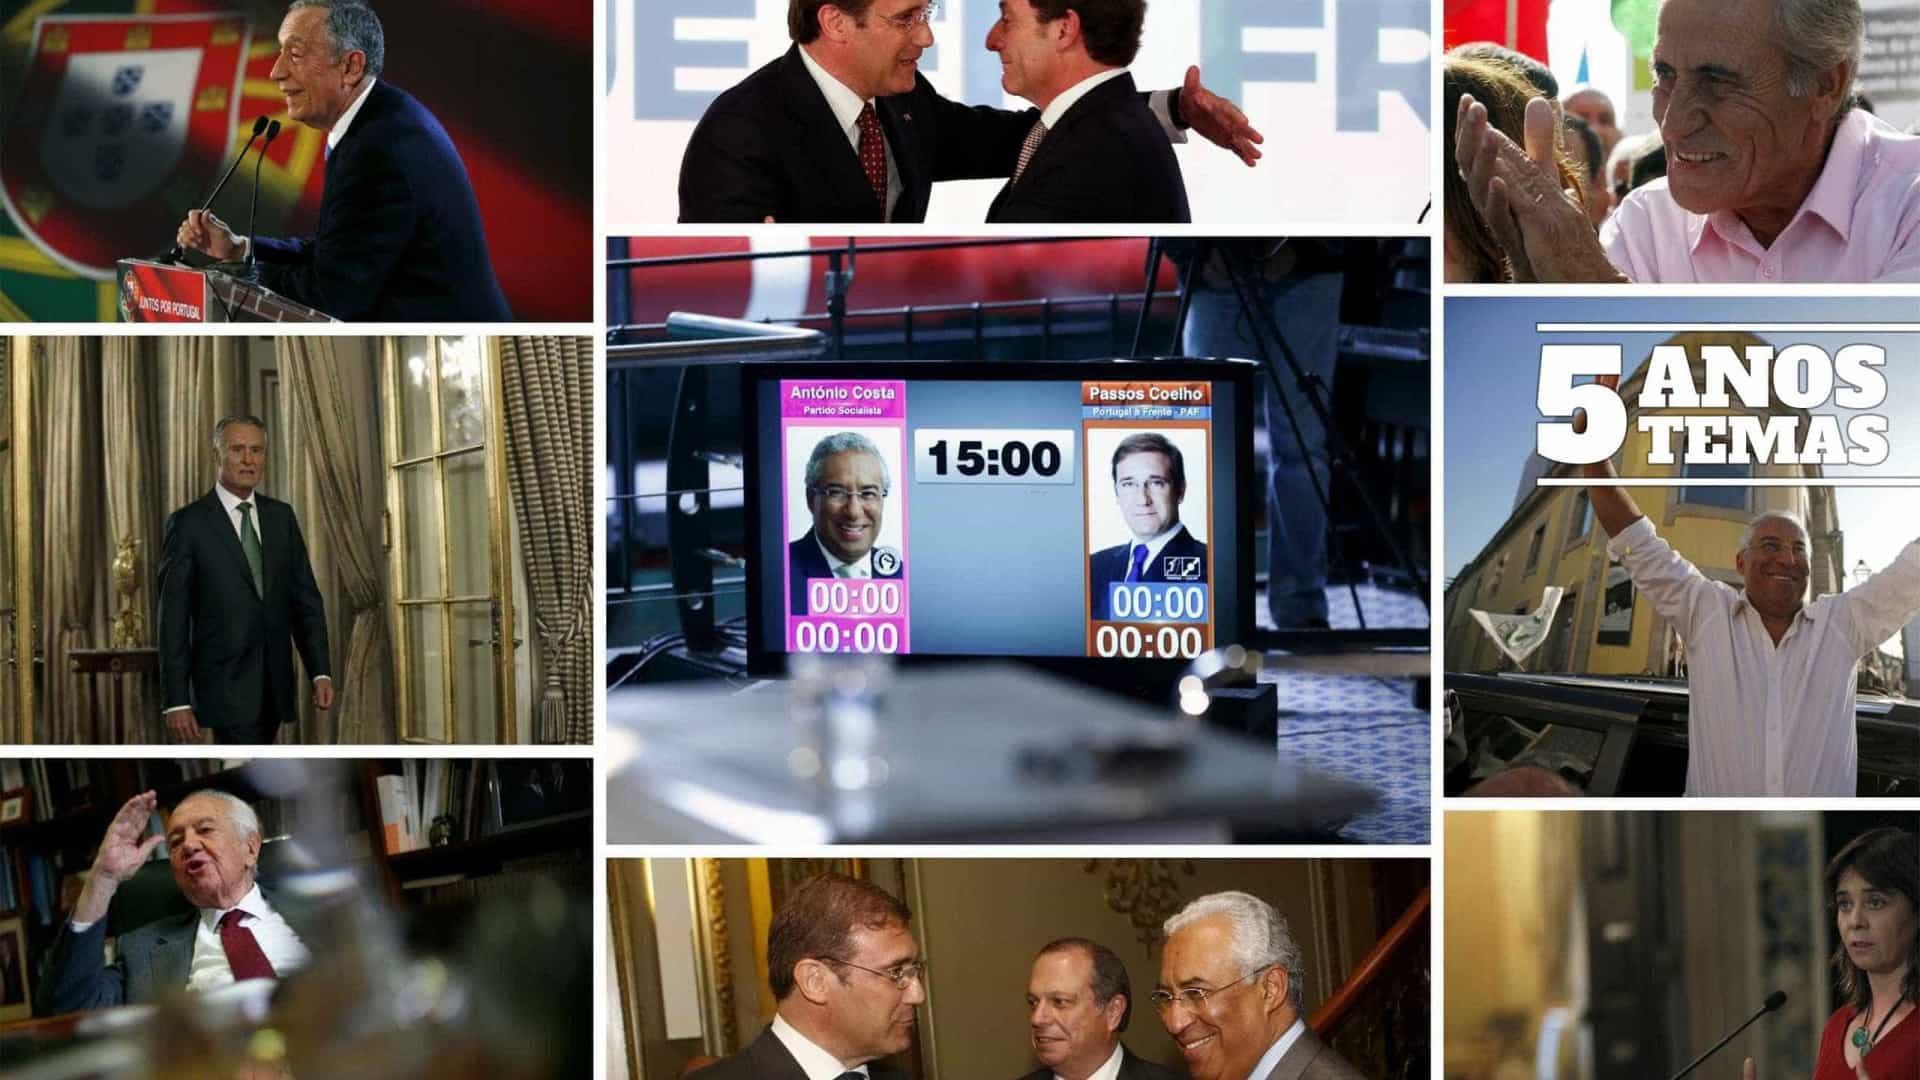 Cinco anos, cinco temas. Os momentos-chave da política lusa